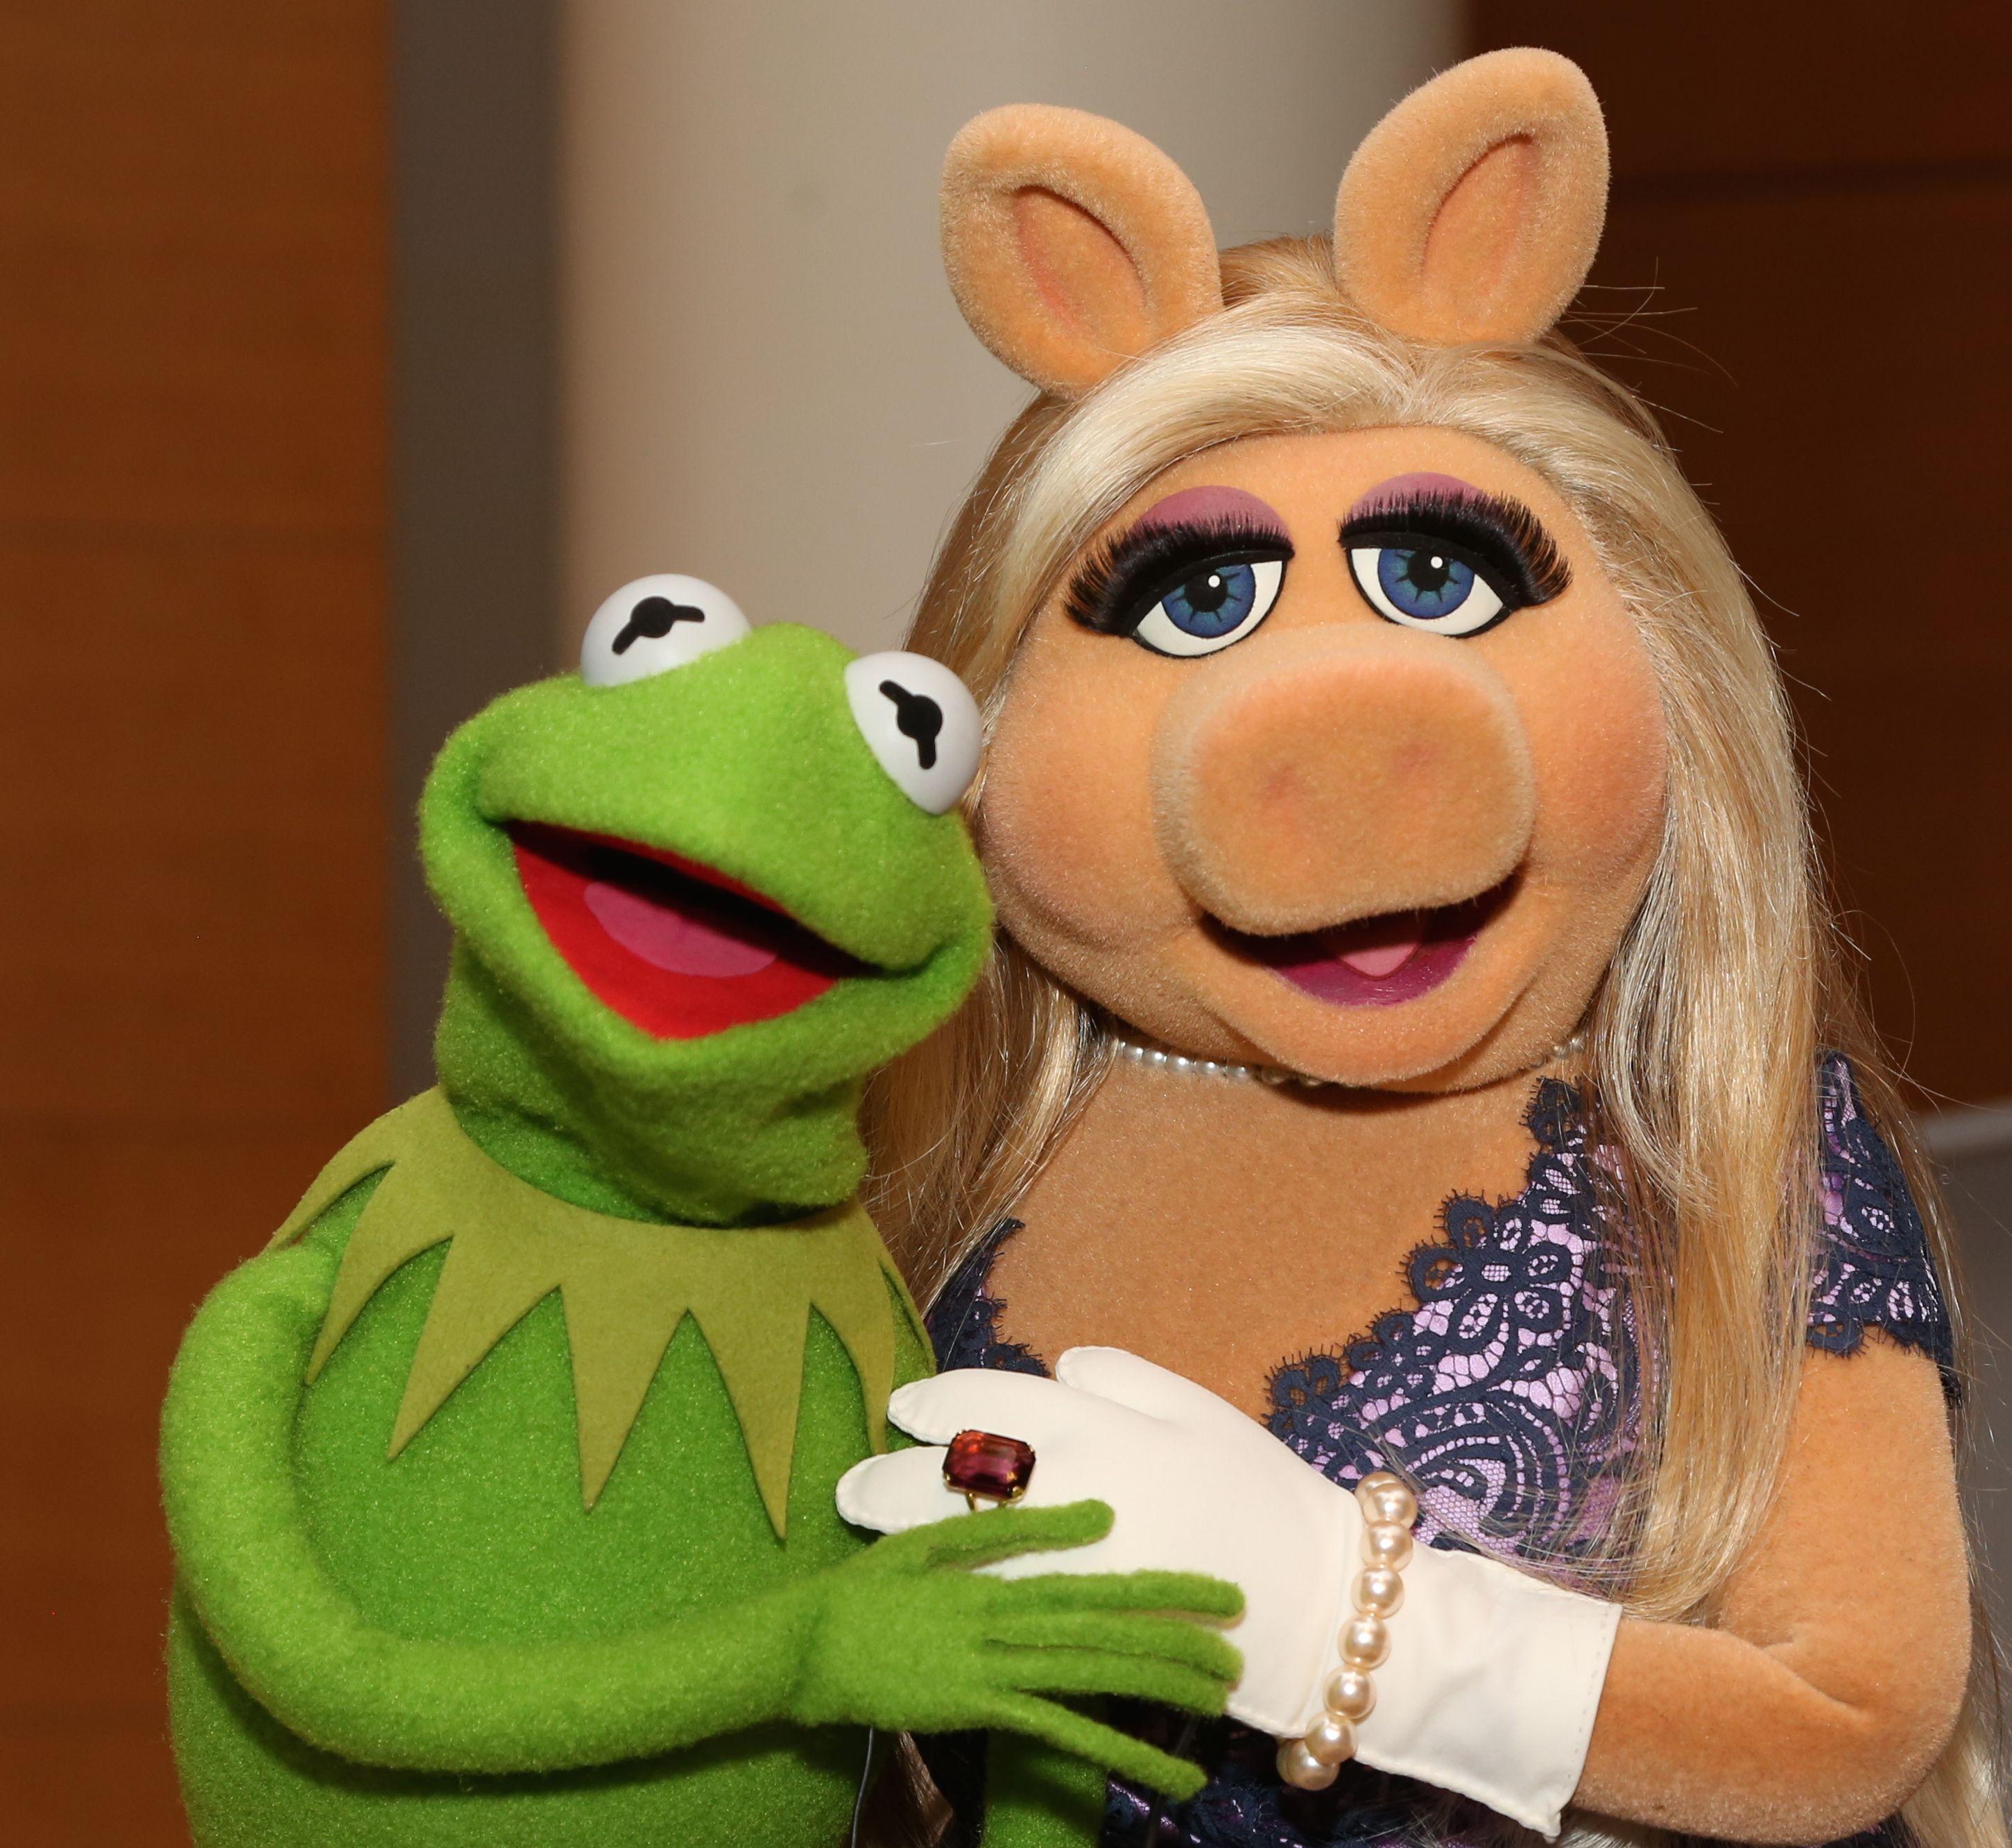 The Muppets Los Teleñecos La Rana Gustavo Triki El: Poll: Should Kermit And Miss Piggy Get Back Together? Cast